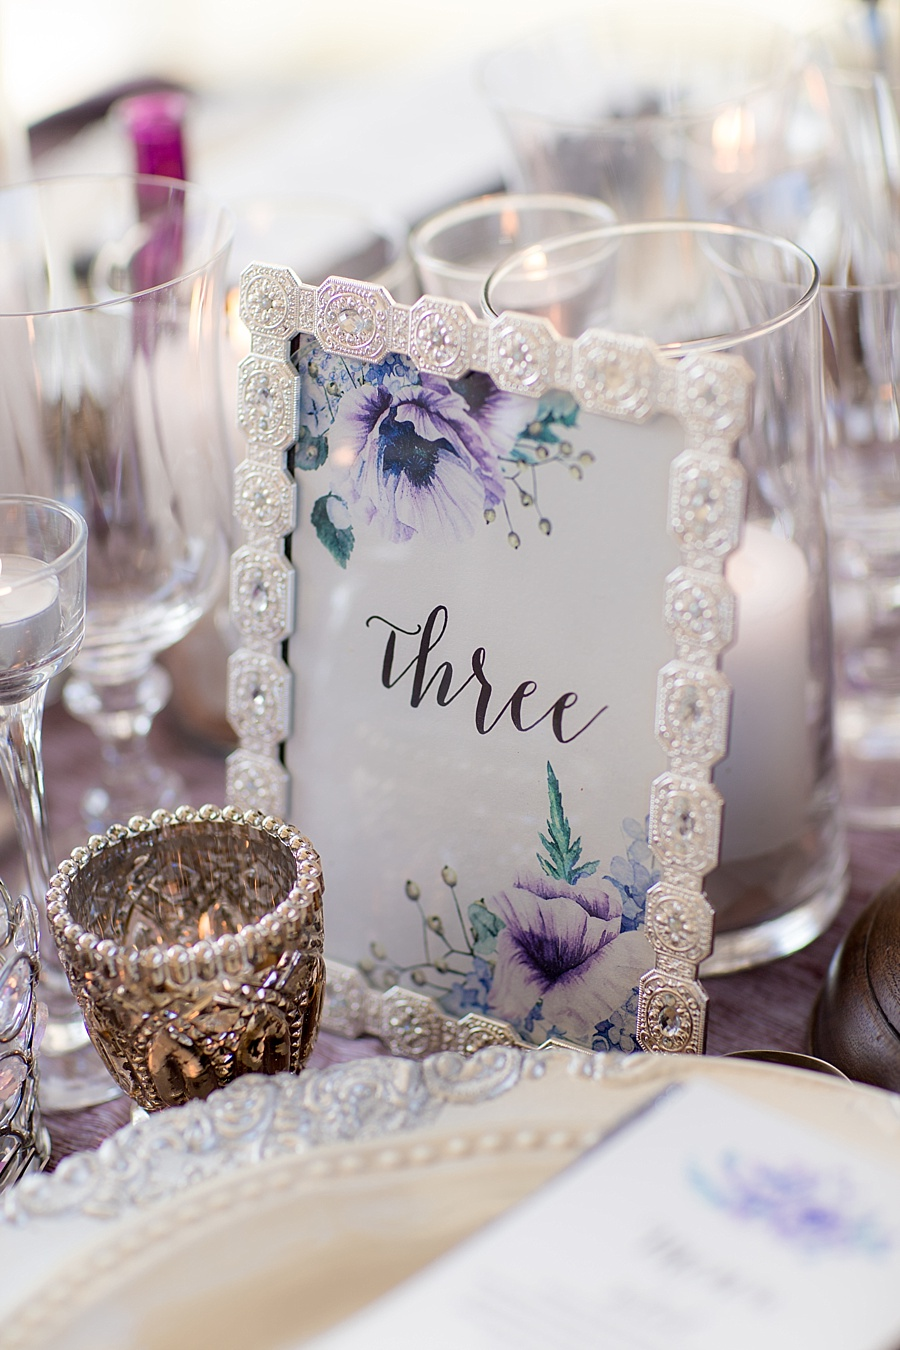 Vanessa_Joy_Photography_Details_of_I_do_Jean_Ralph_Thurin_Wedding_Gowns_April_Lynn_Designs_Wedding_Stationery7